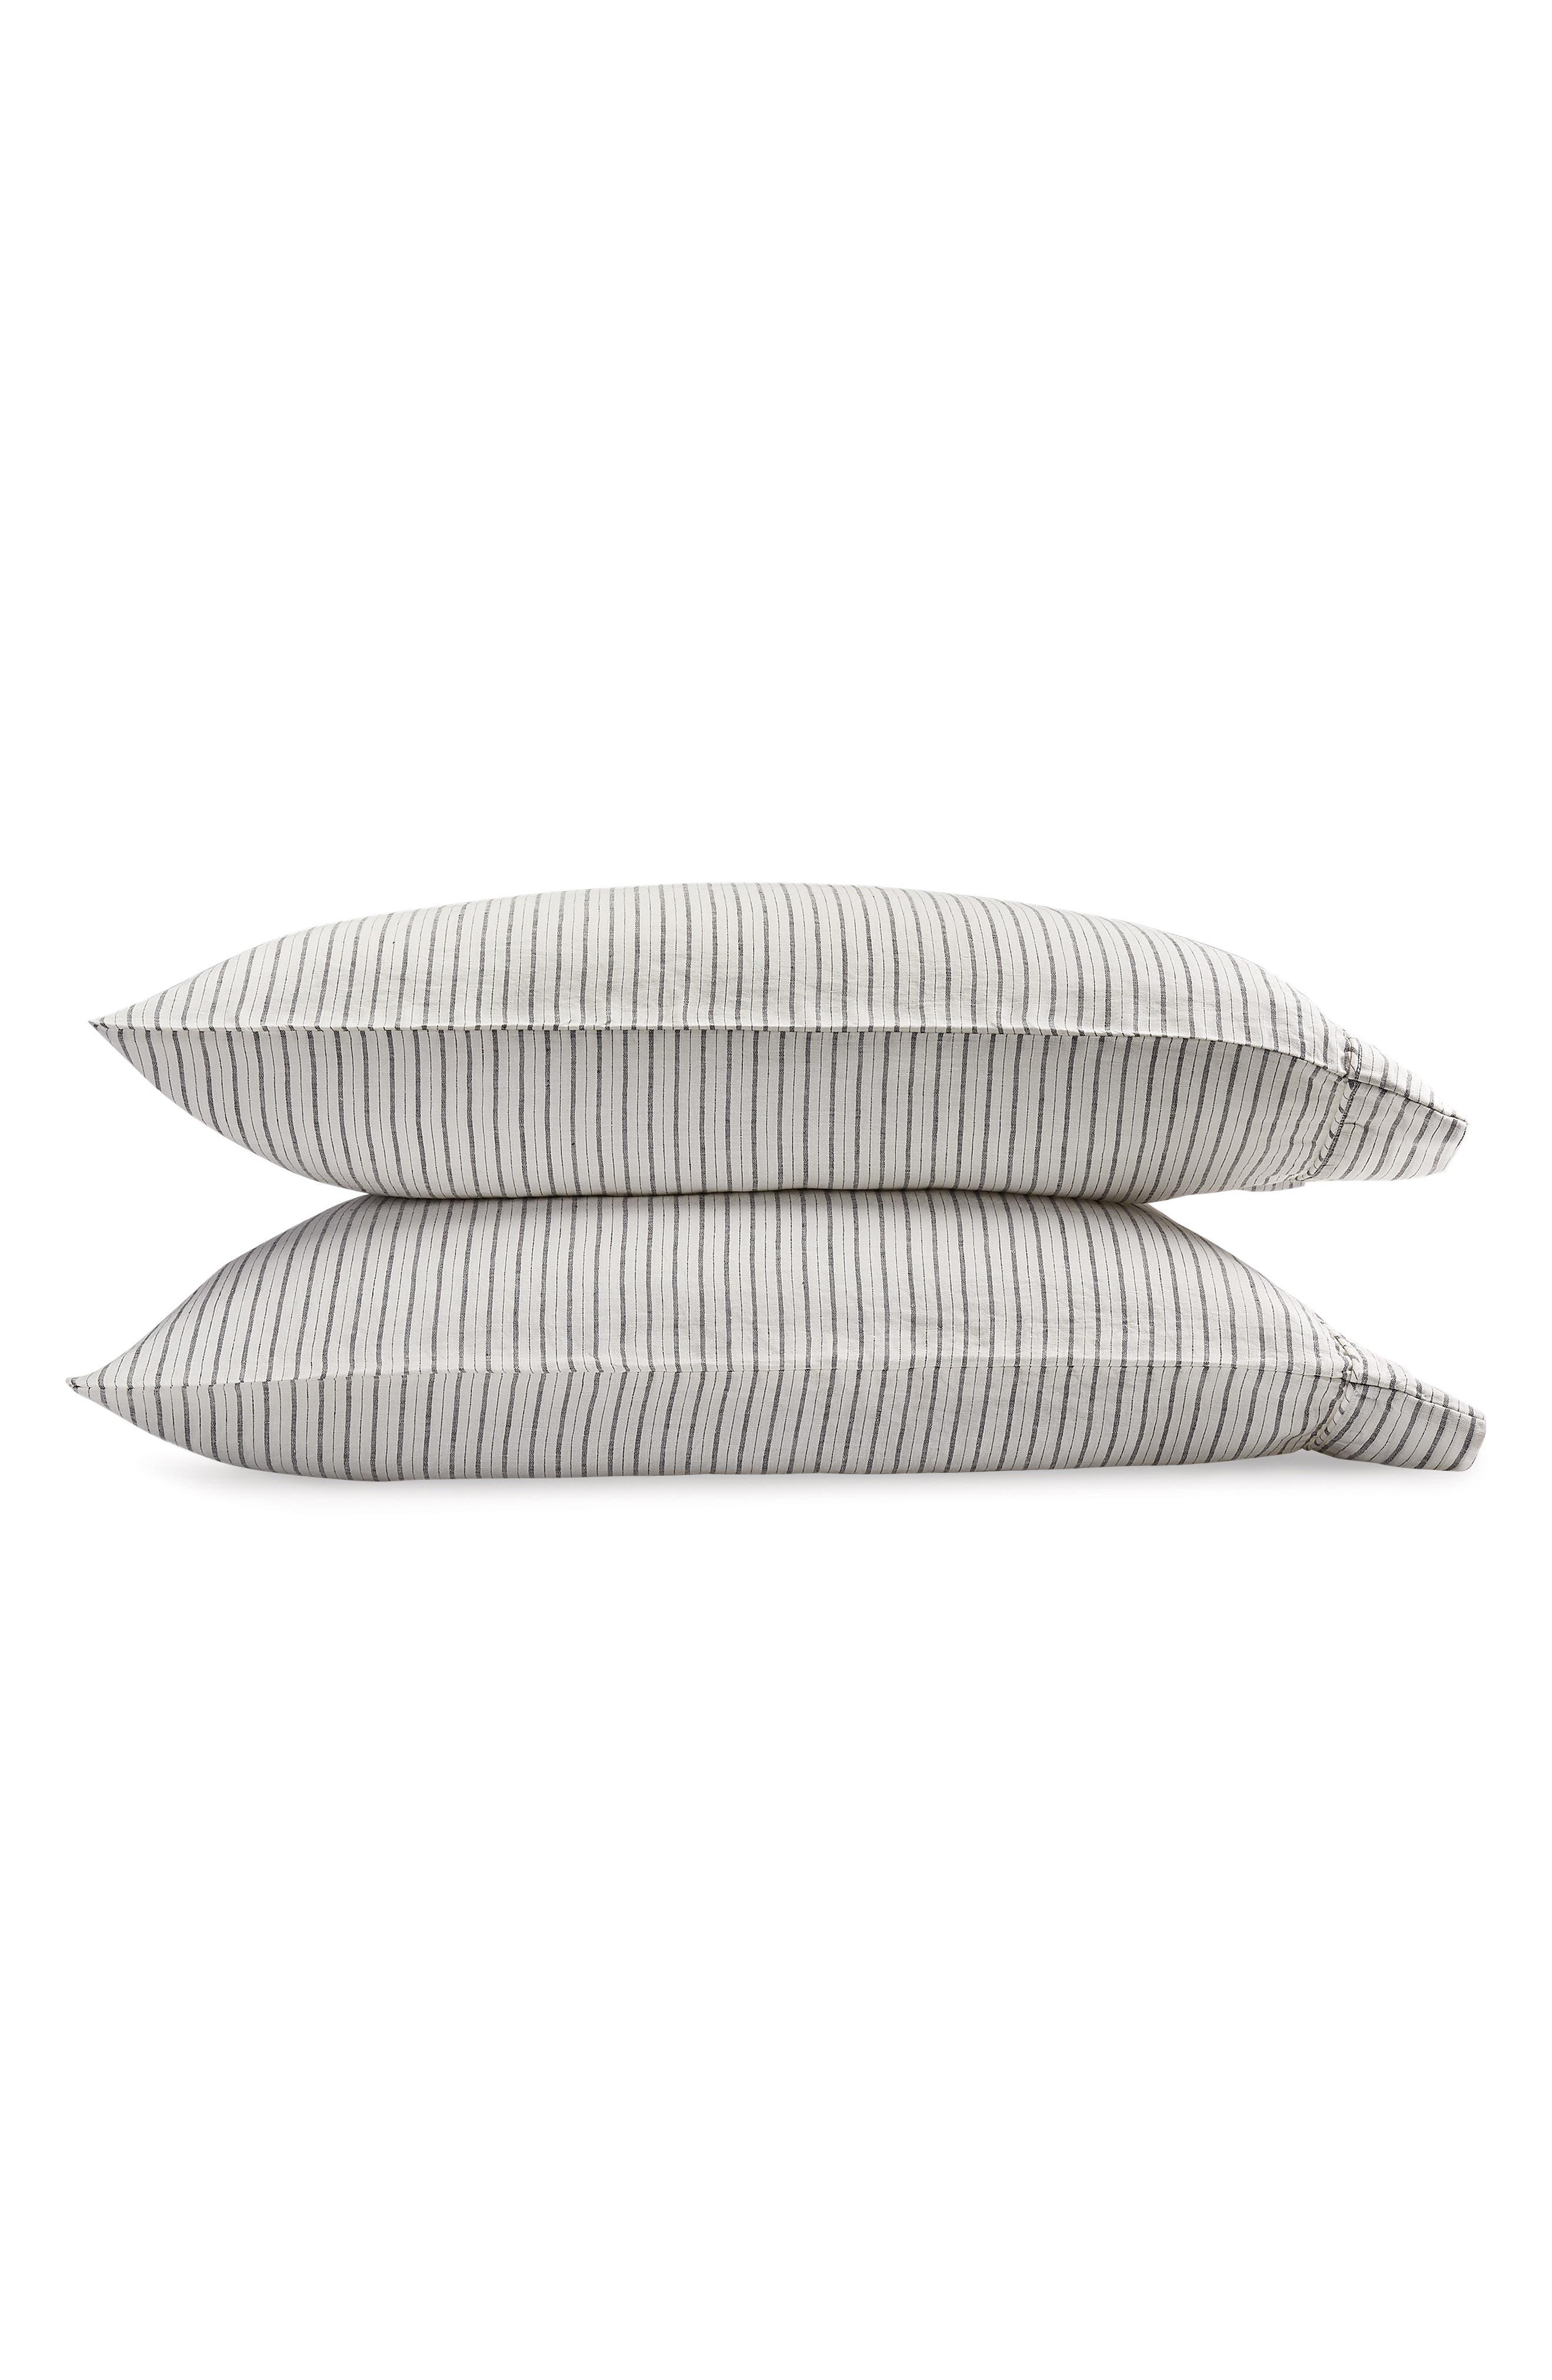 Tristen Set of 2 Linen Pillowcases, Main, color, WHITE/ ANTHRACITE